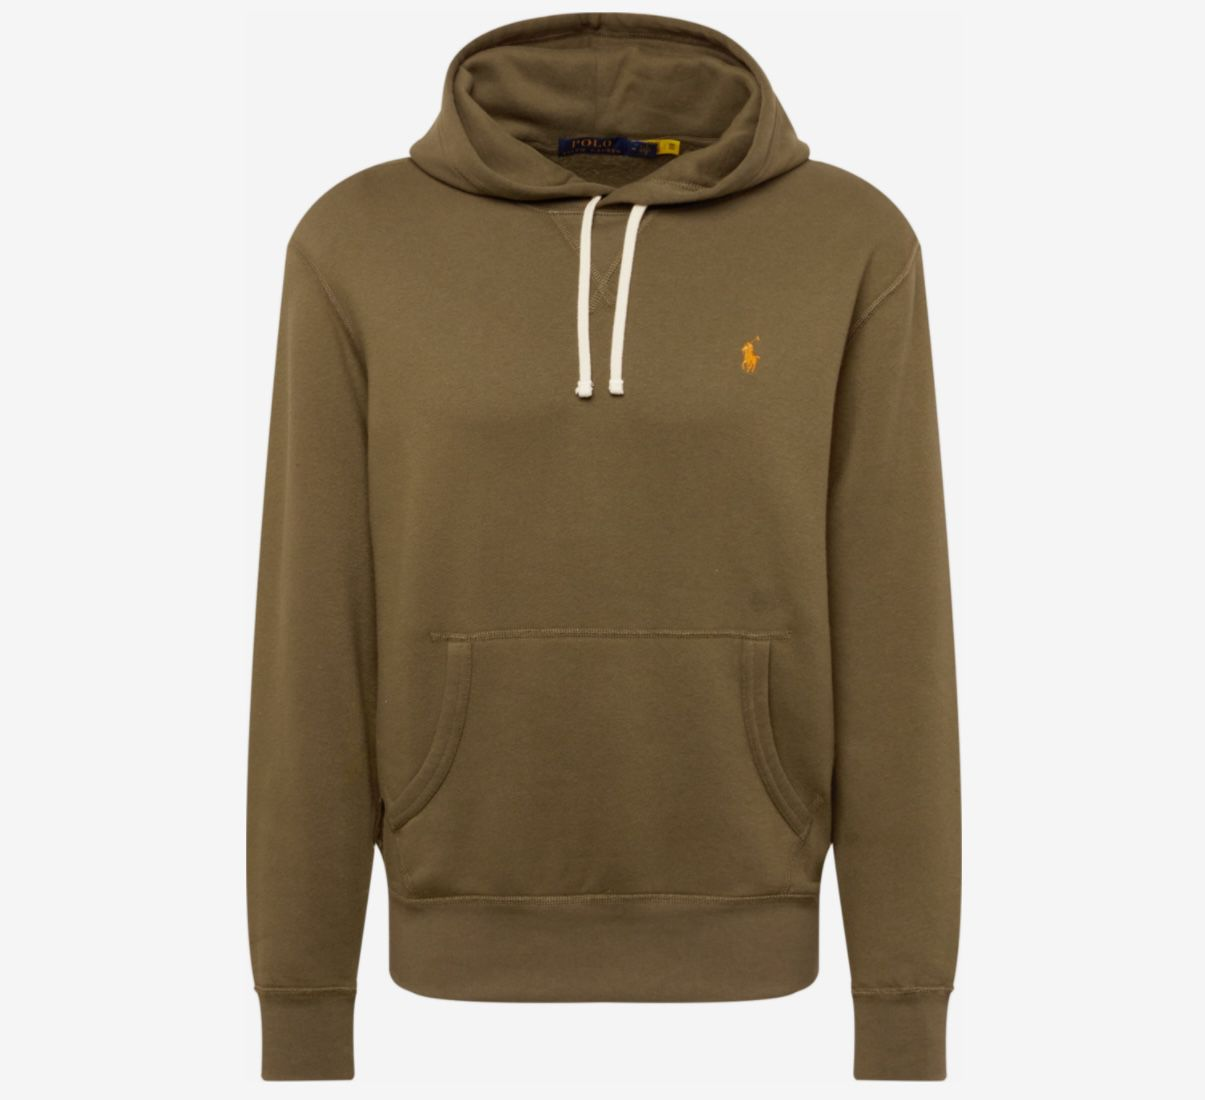 Polo Ralph Lauren Herren Sweatshirt in Khaki für 135,20€ (statt 170€)